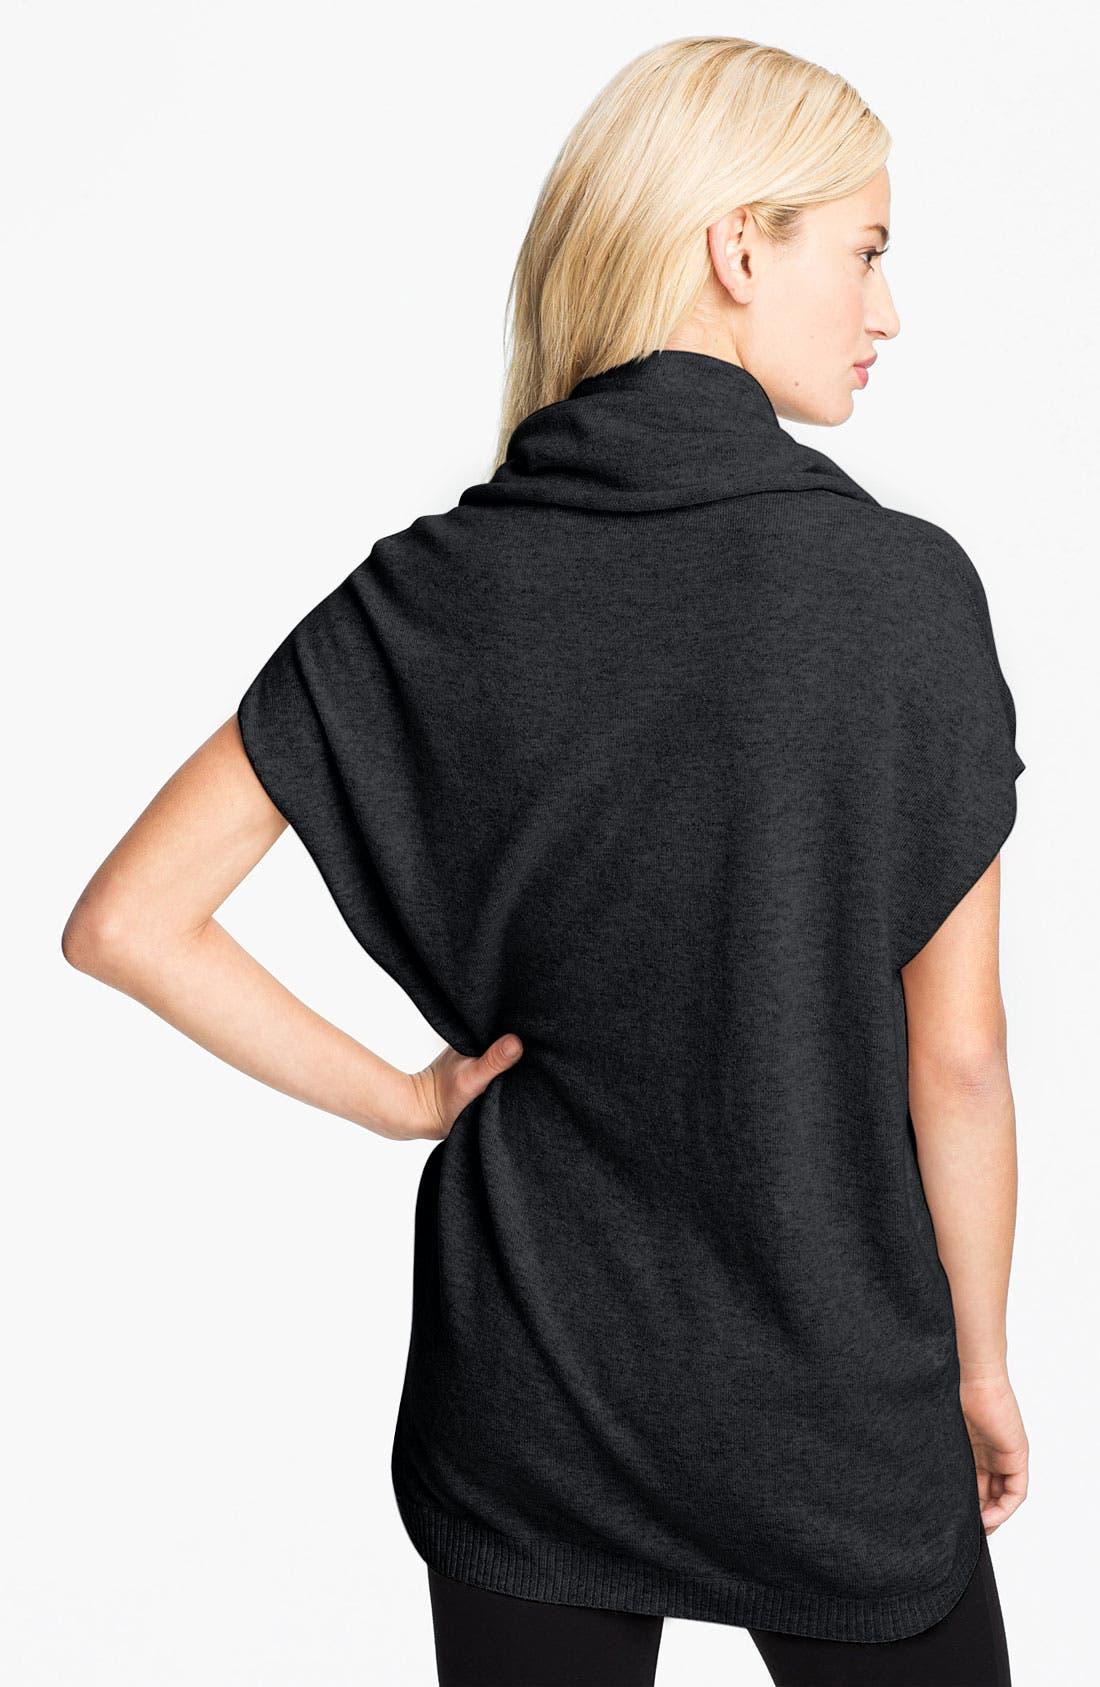 Alternate Image 2  - Christopher Fischer 'Honoria' Cowl Neck Cashmere Sweater (Online Exclusive)